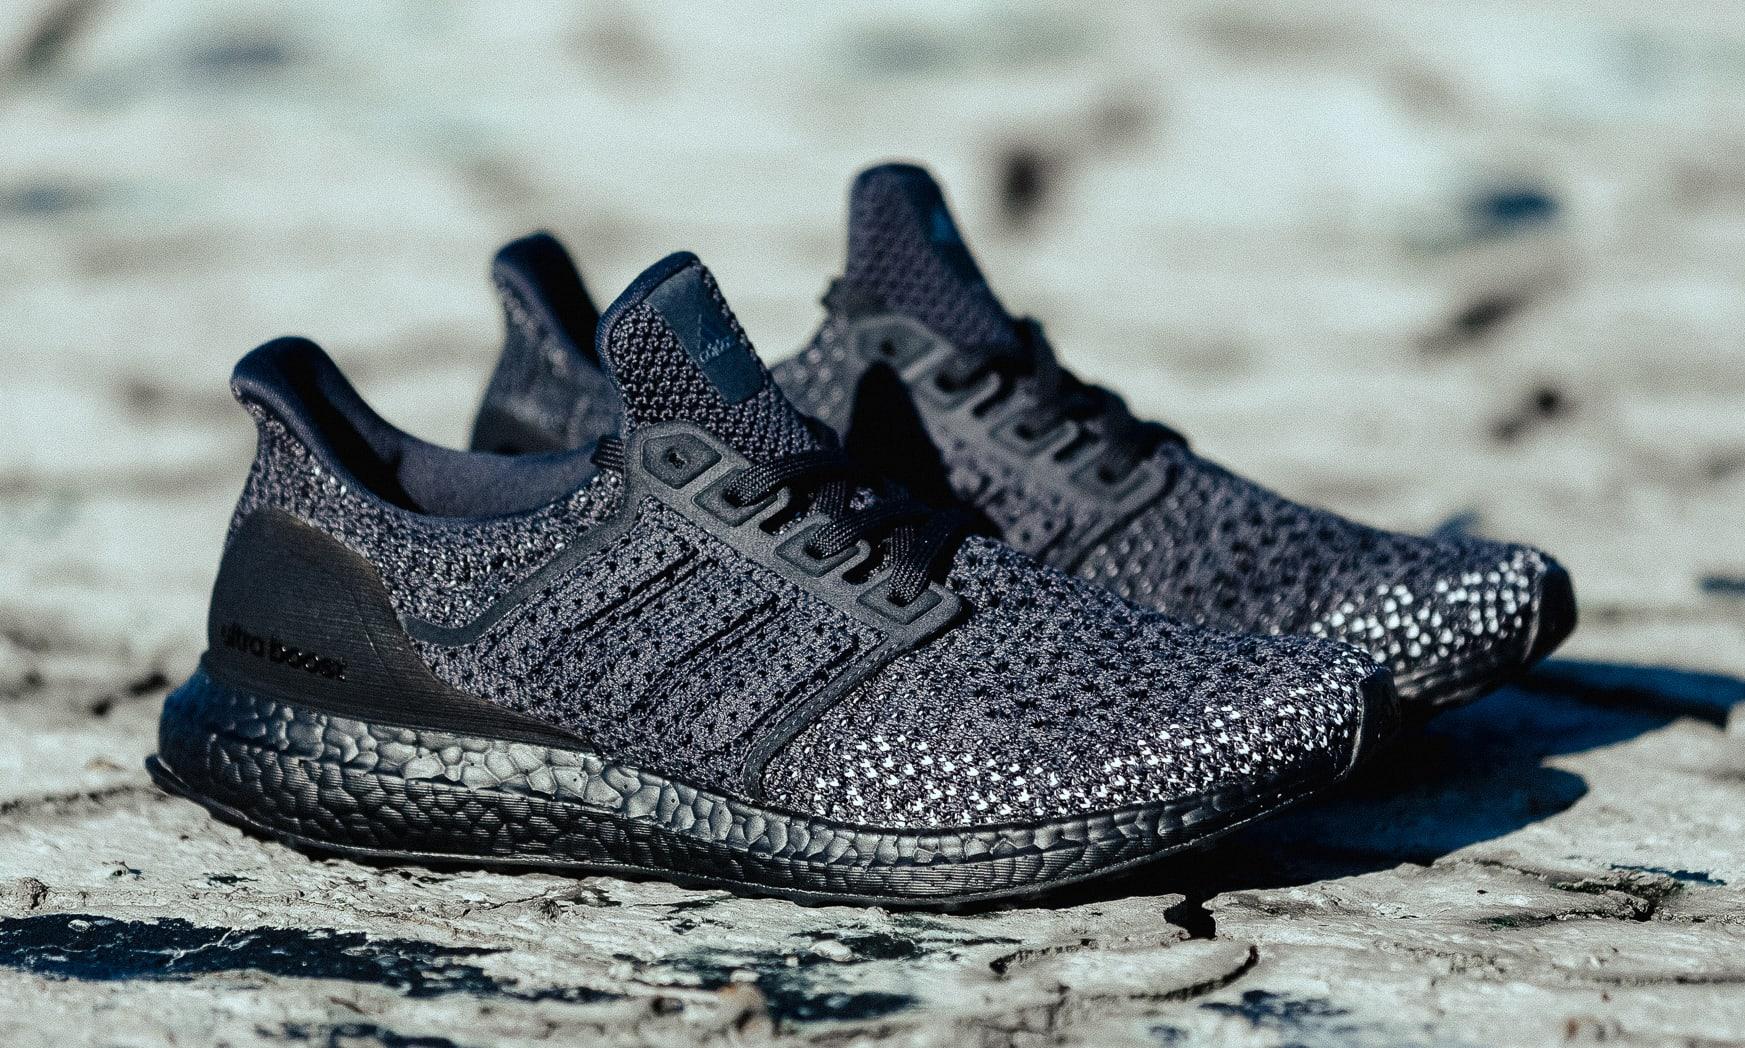 fdee3c793b92c ... 50% off buy cheap 100 original cheap high quality adidas black  ultraboost clima sneakers high